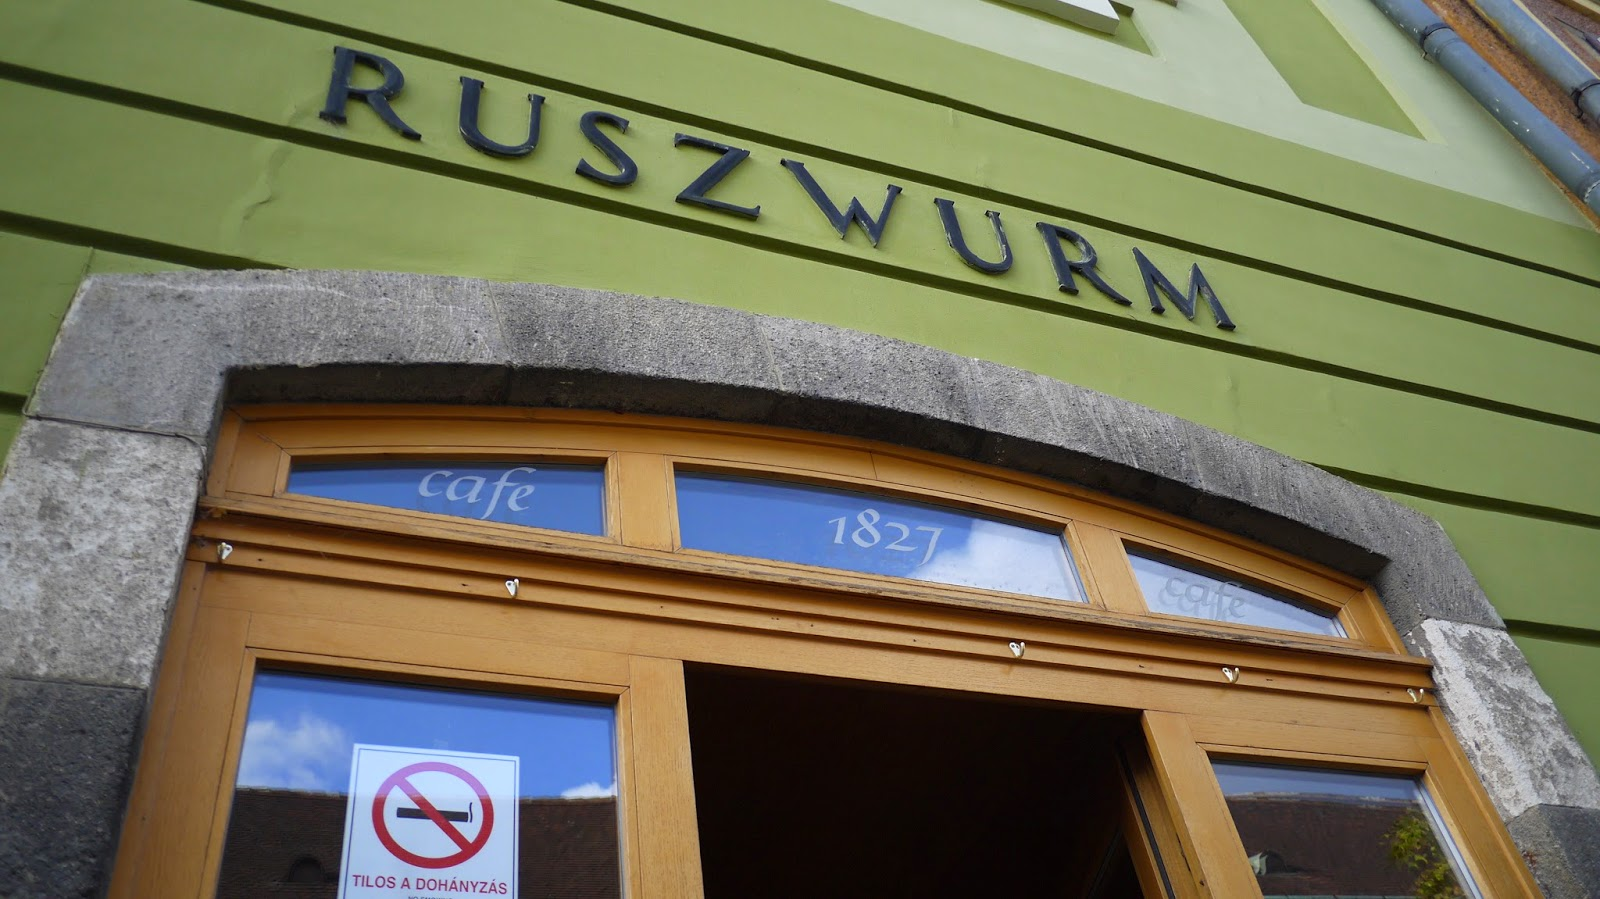 Ruszwurm Budapest